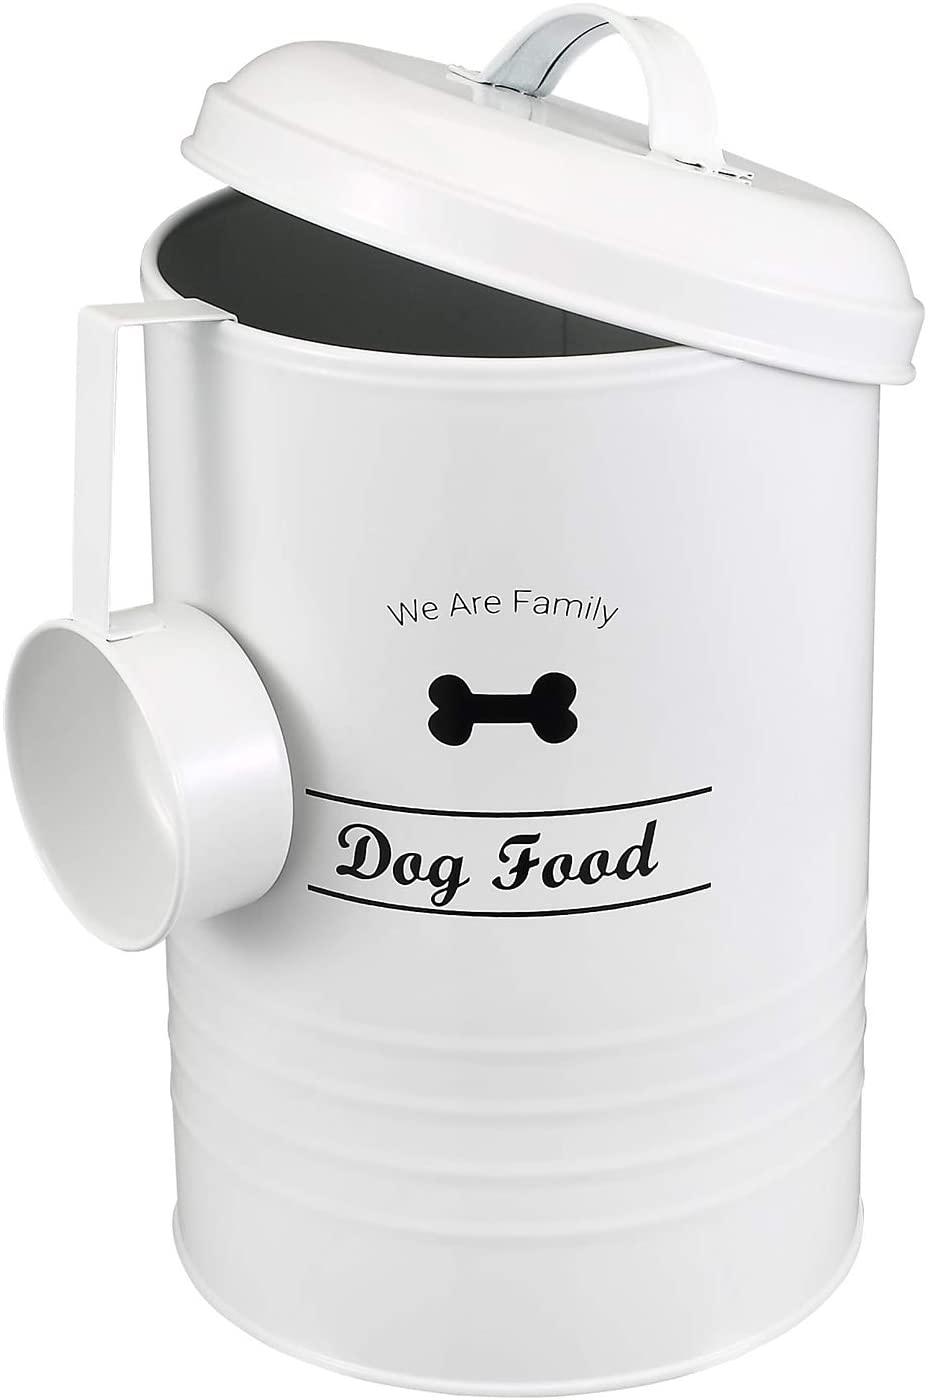 Brabtod Circular Design Pet Food Treat Canister Dog Treat Serving Scoop